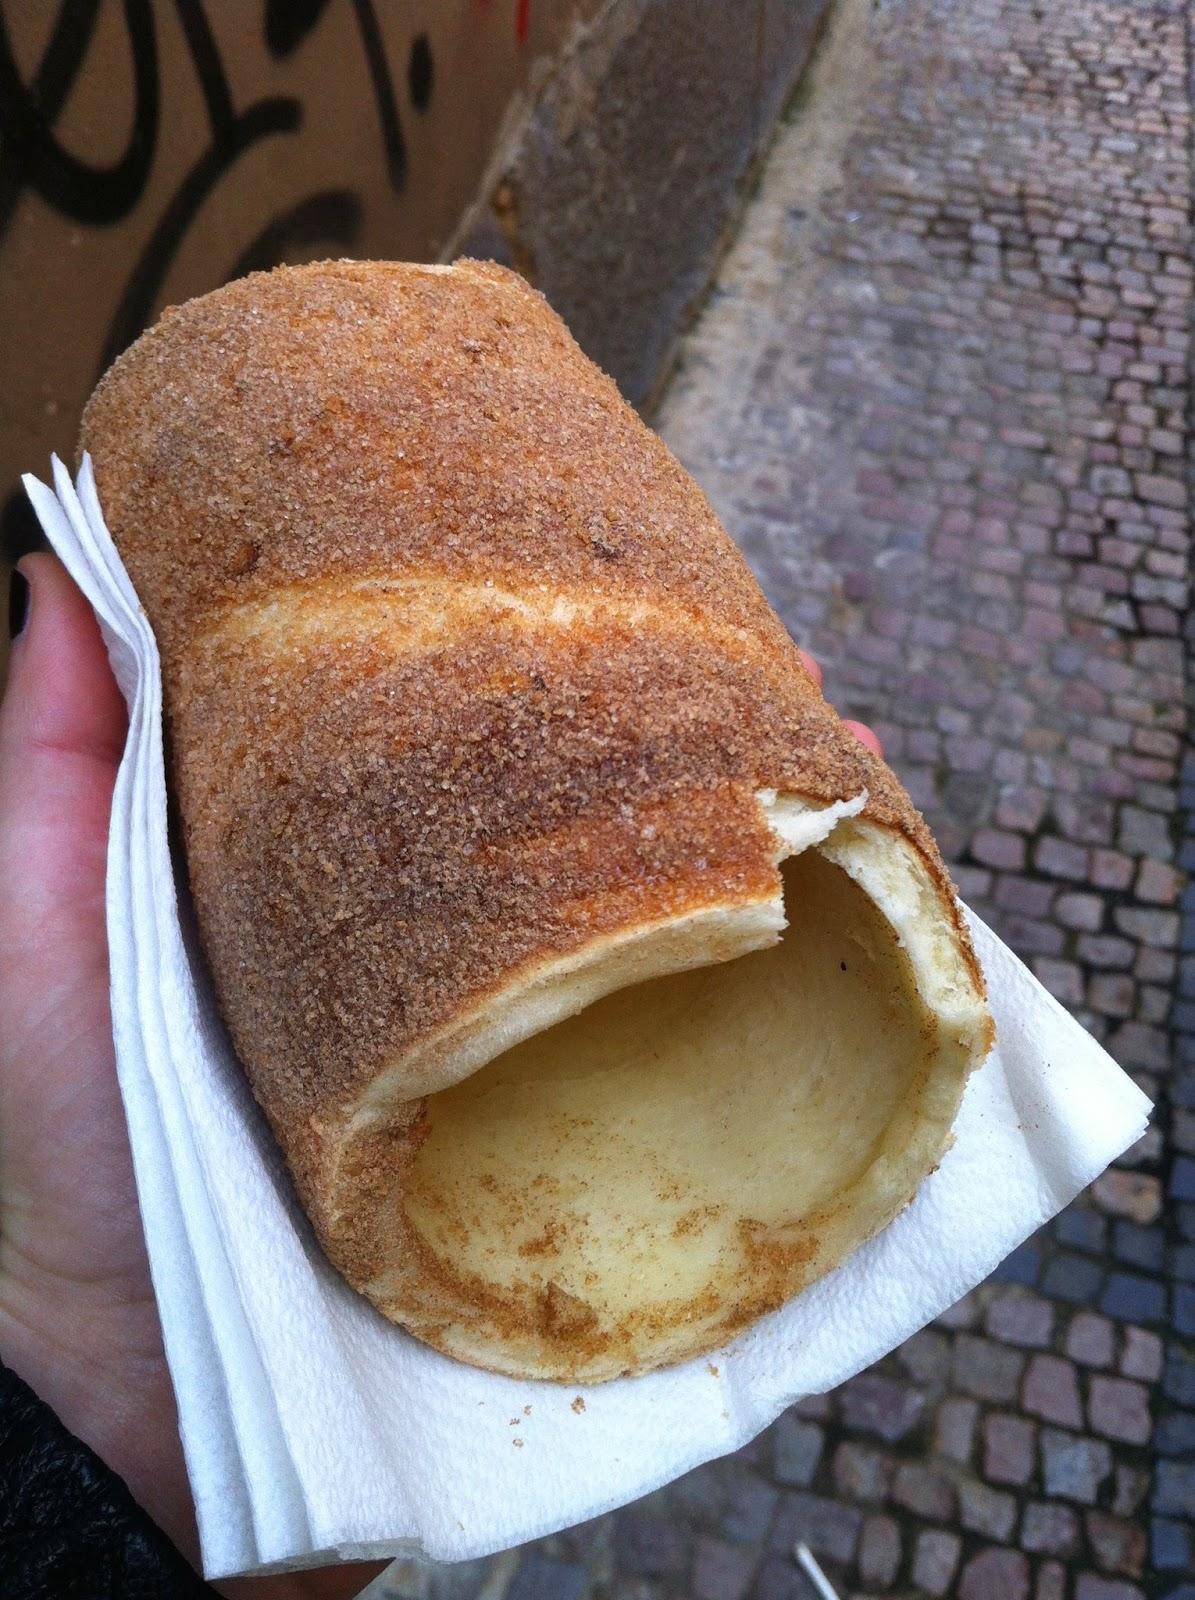 a trdelnik pastry in Prague